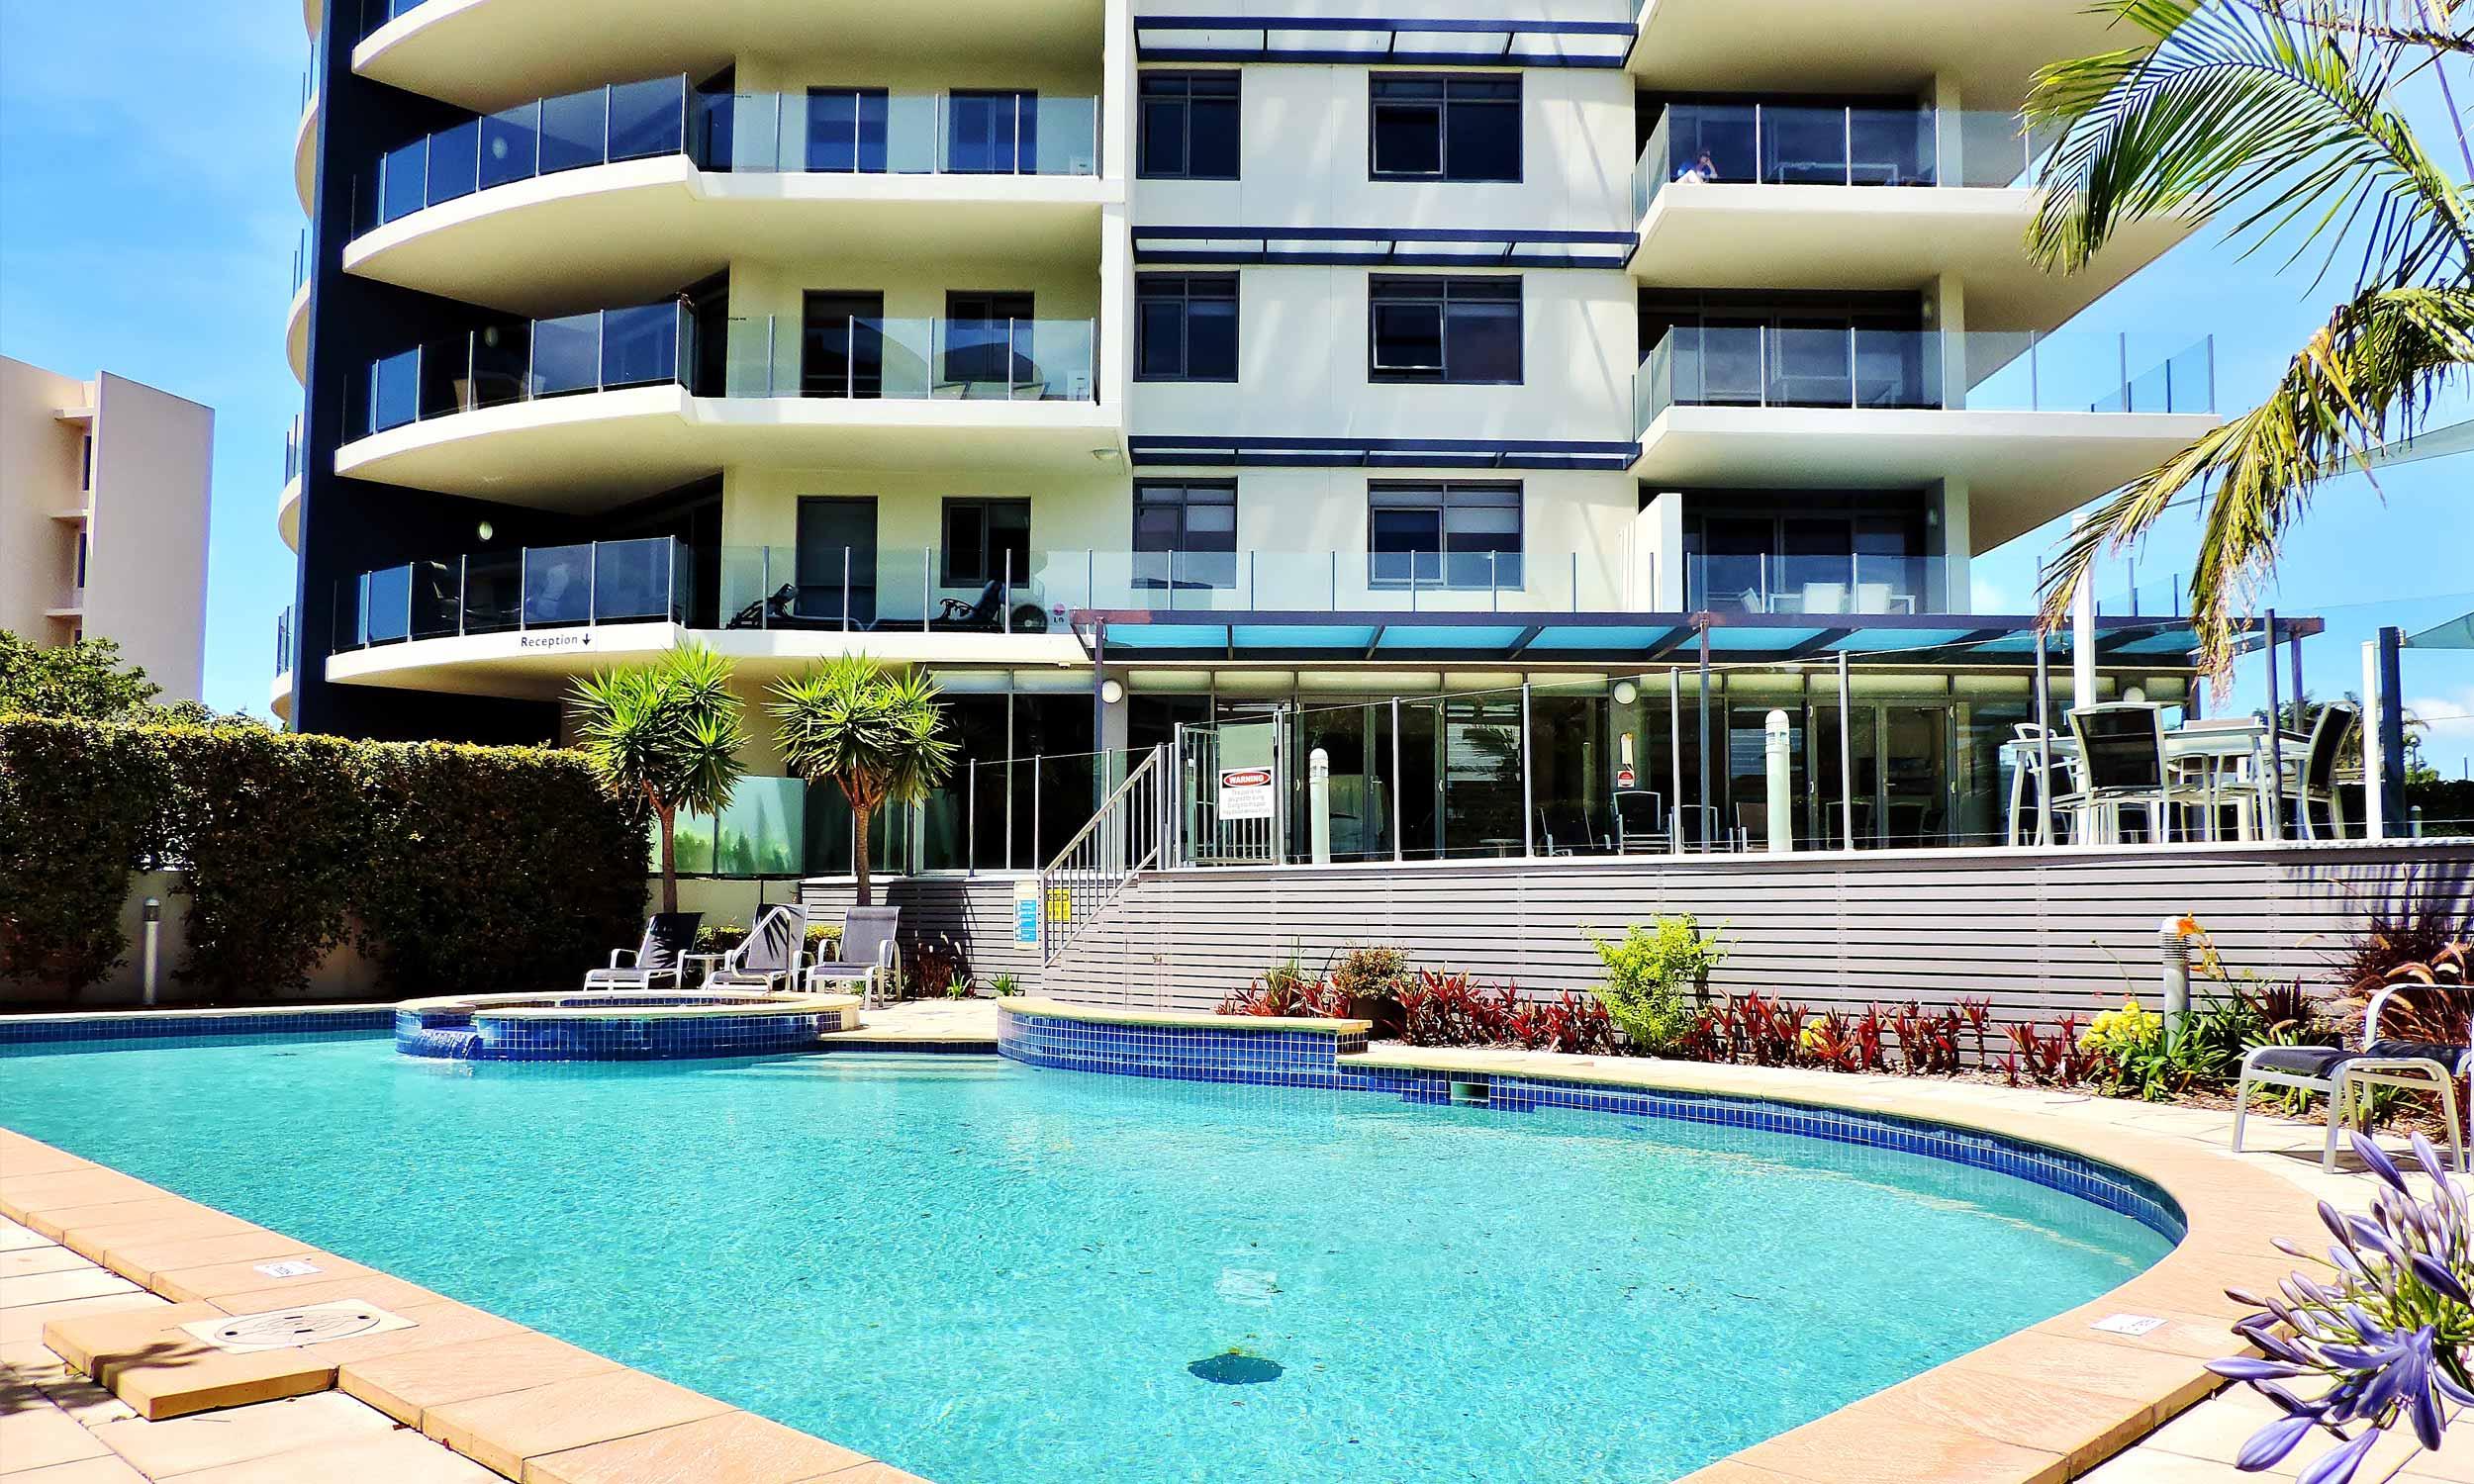 sevan-apartments-swimming-pool-forster-nsw.jpg